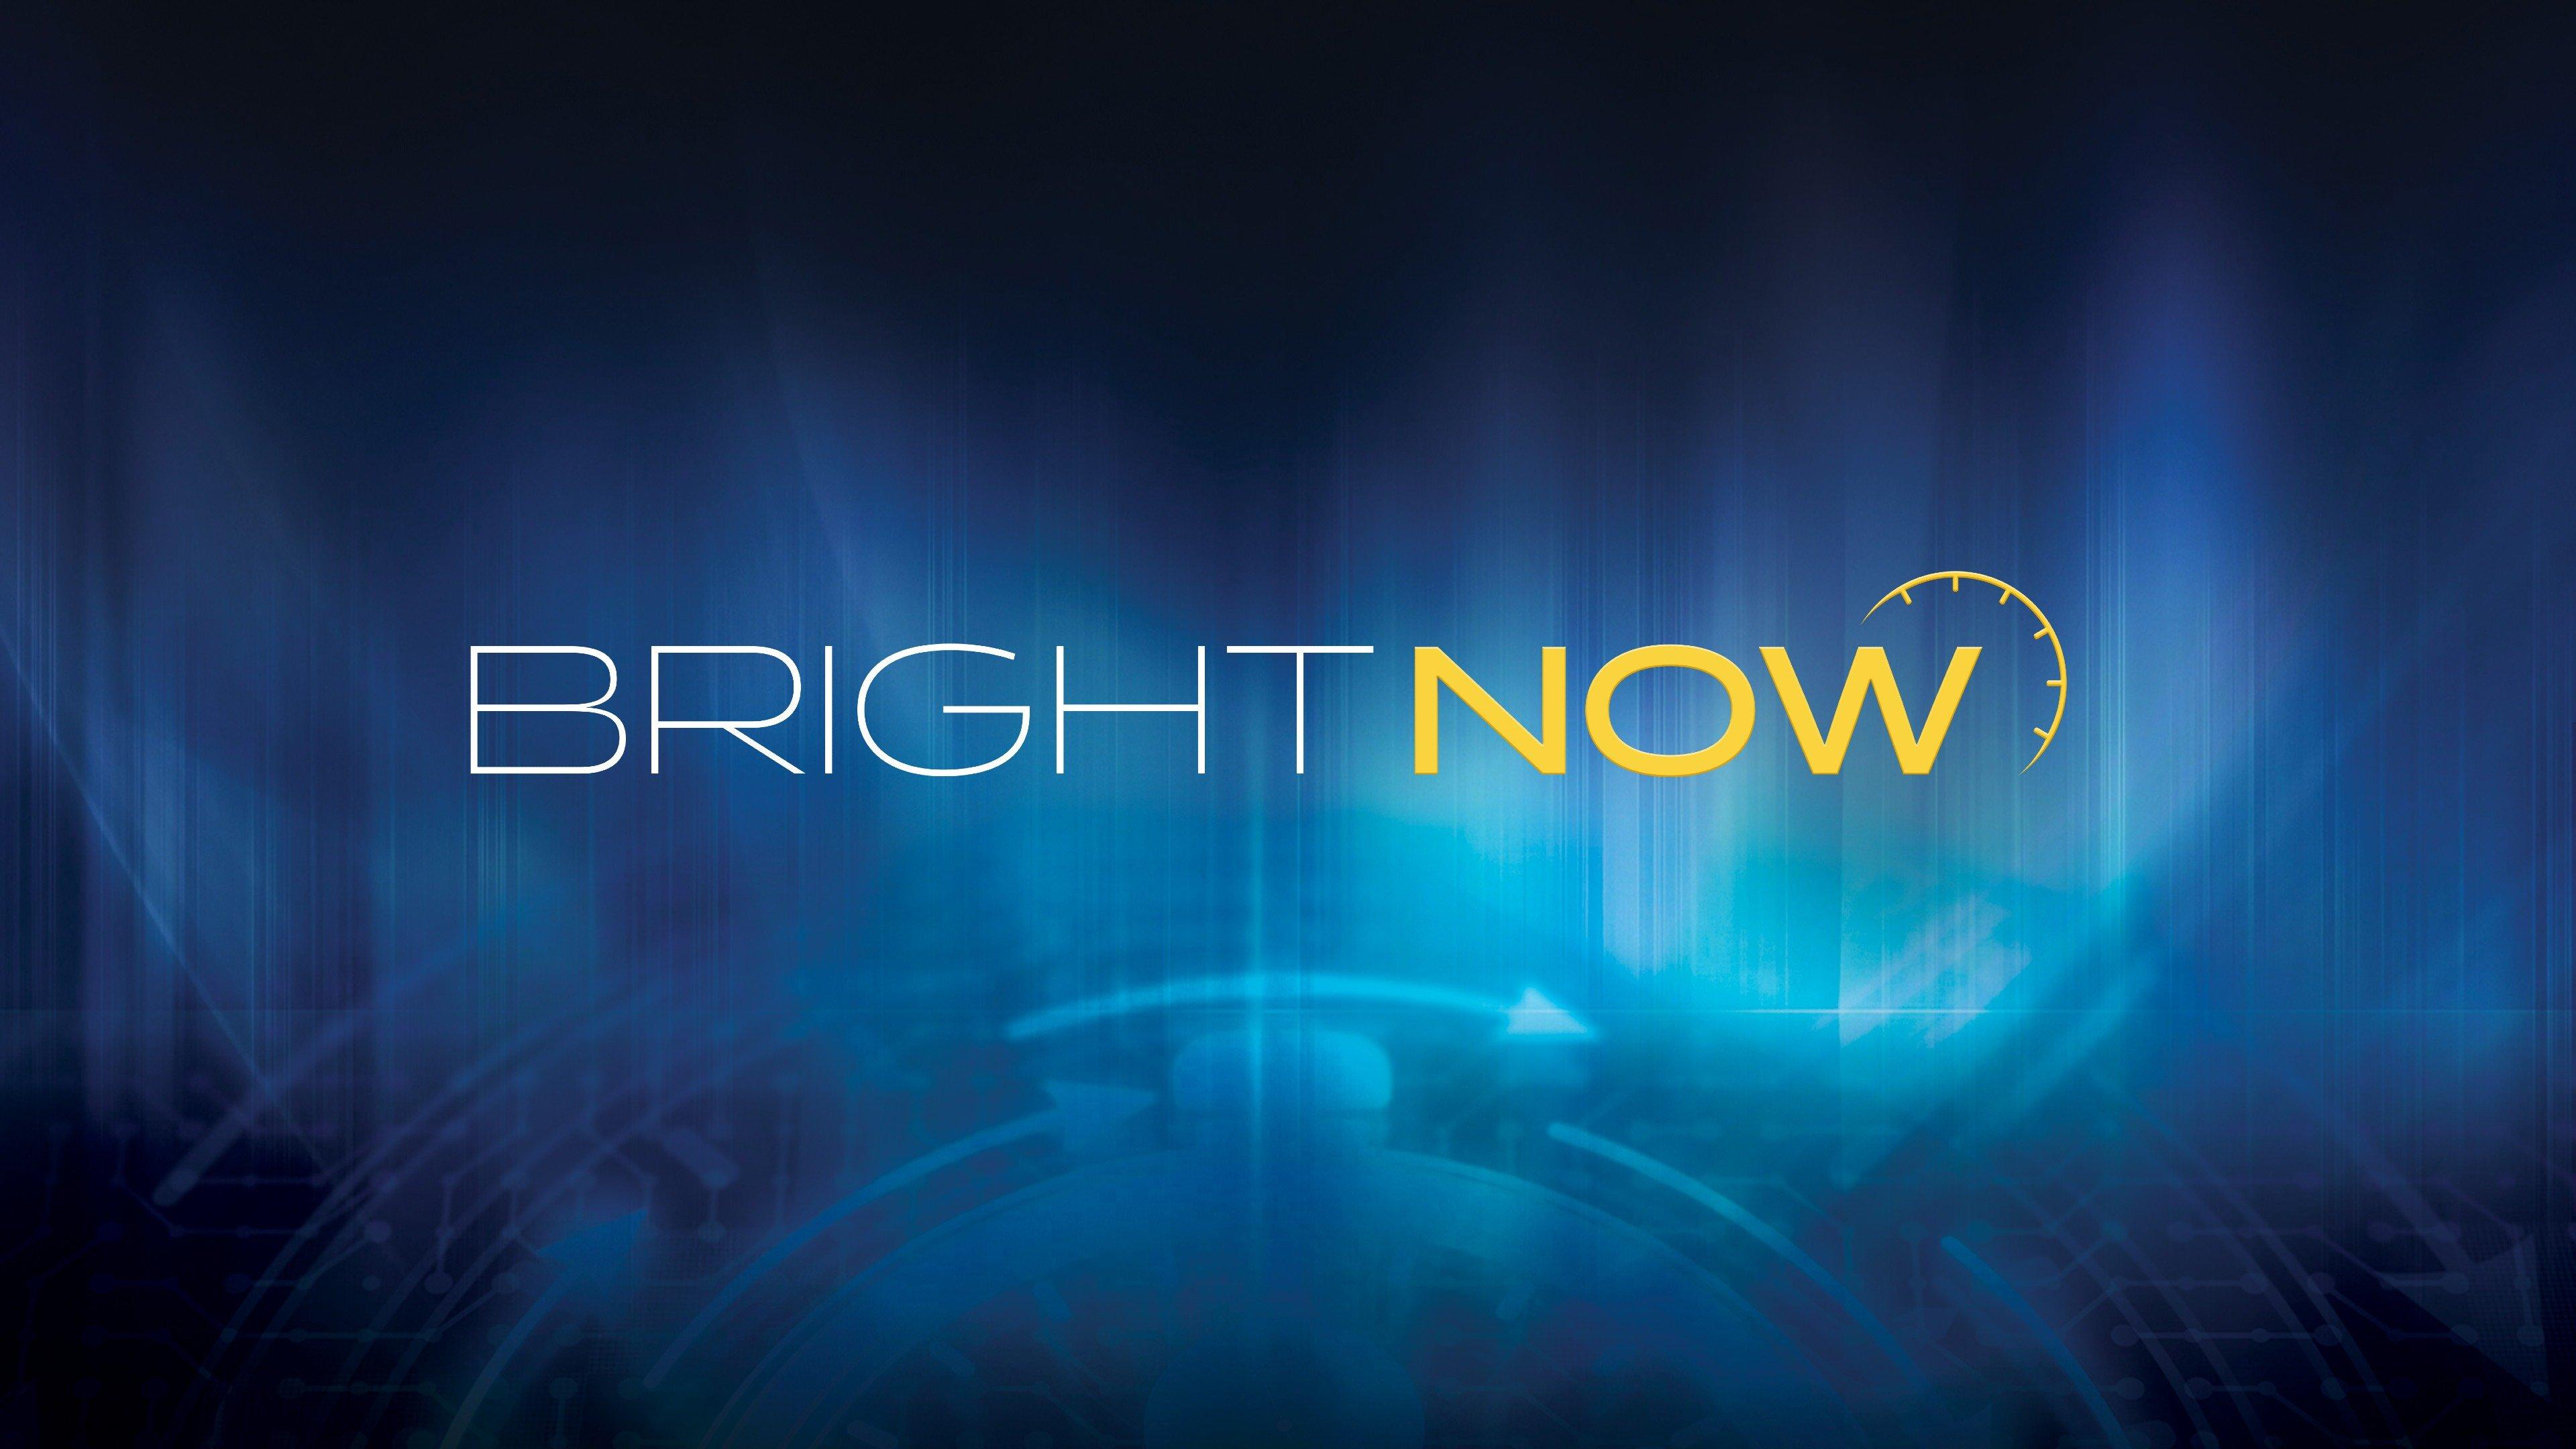 Bright Now!